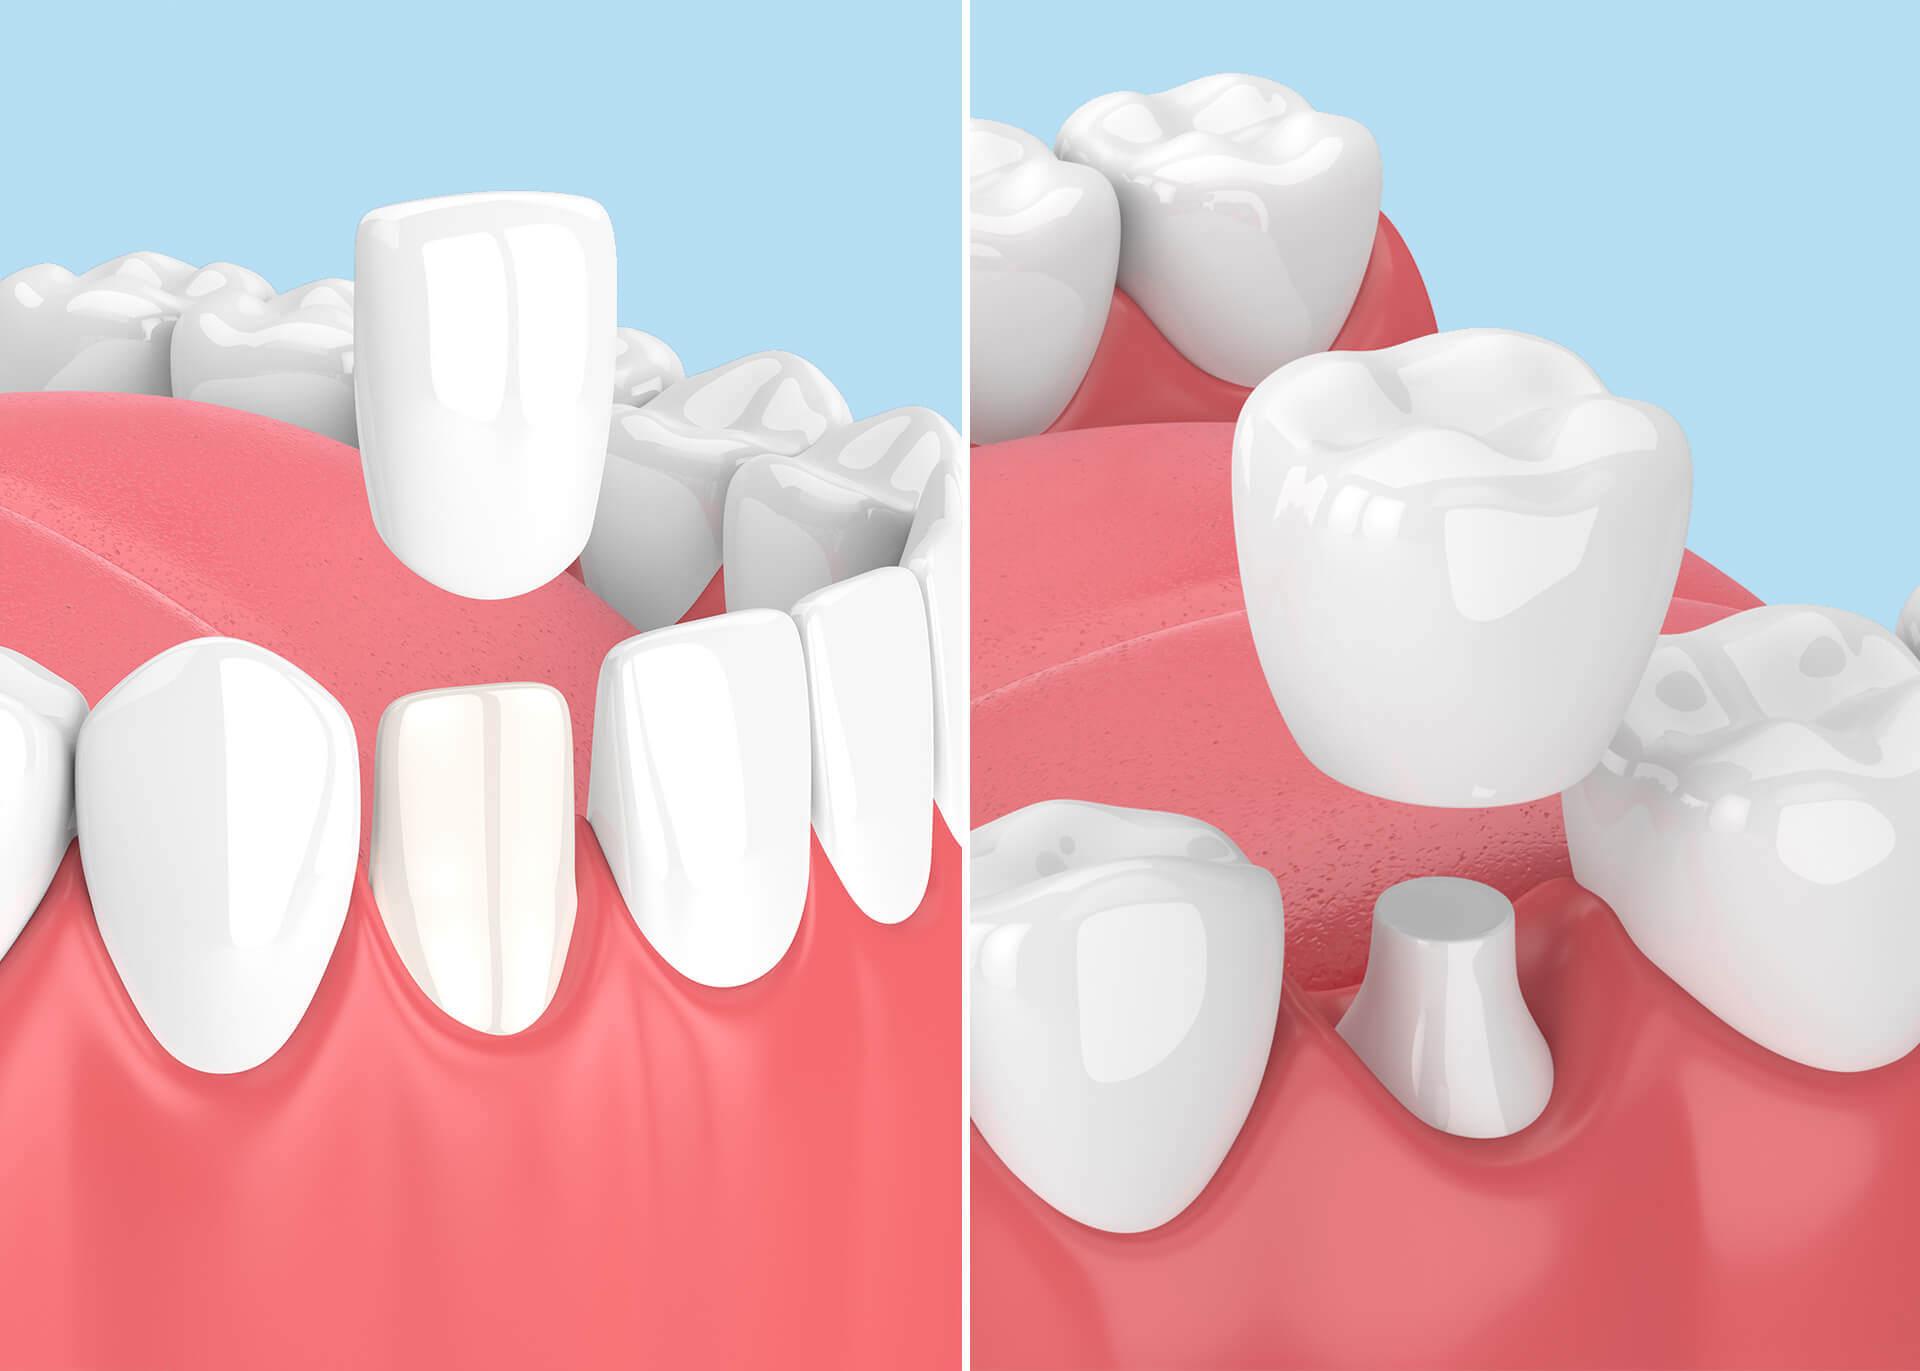 Facette dentaire ou couronne dentaire